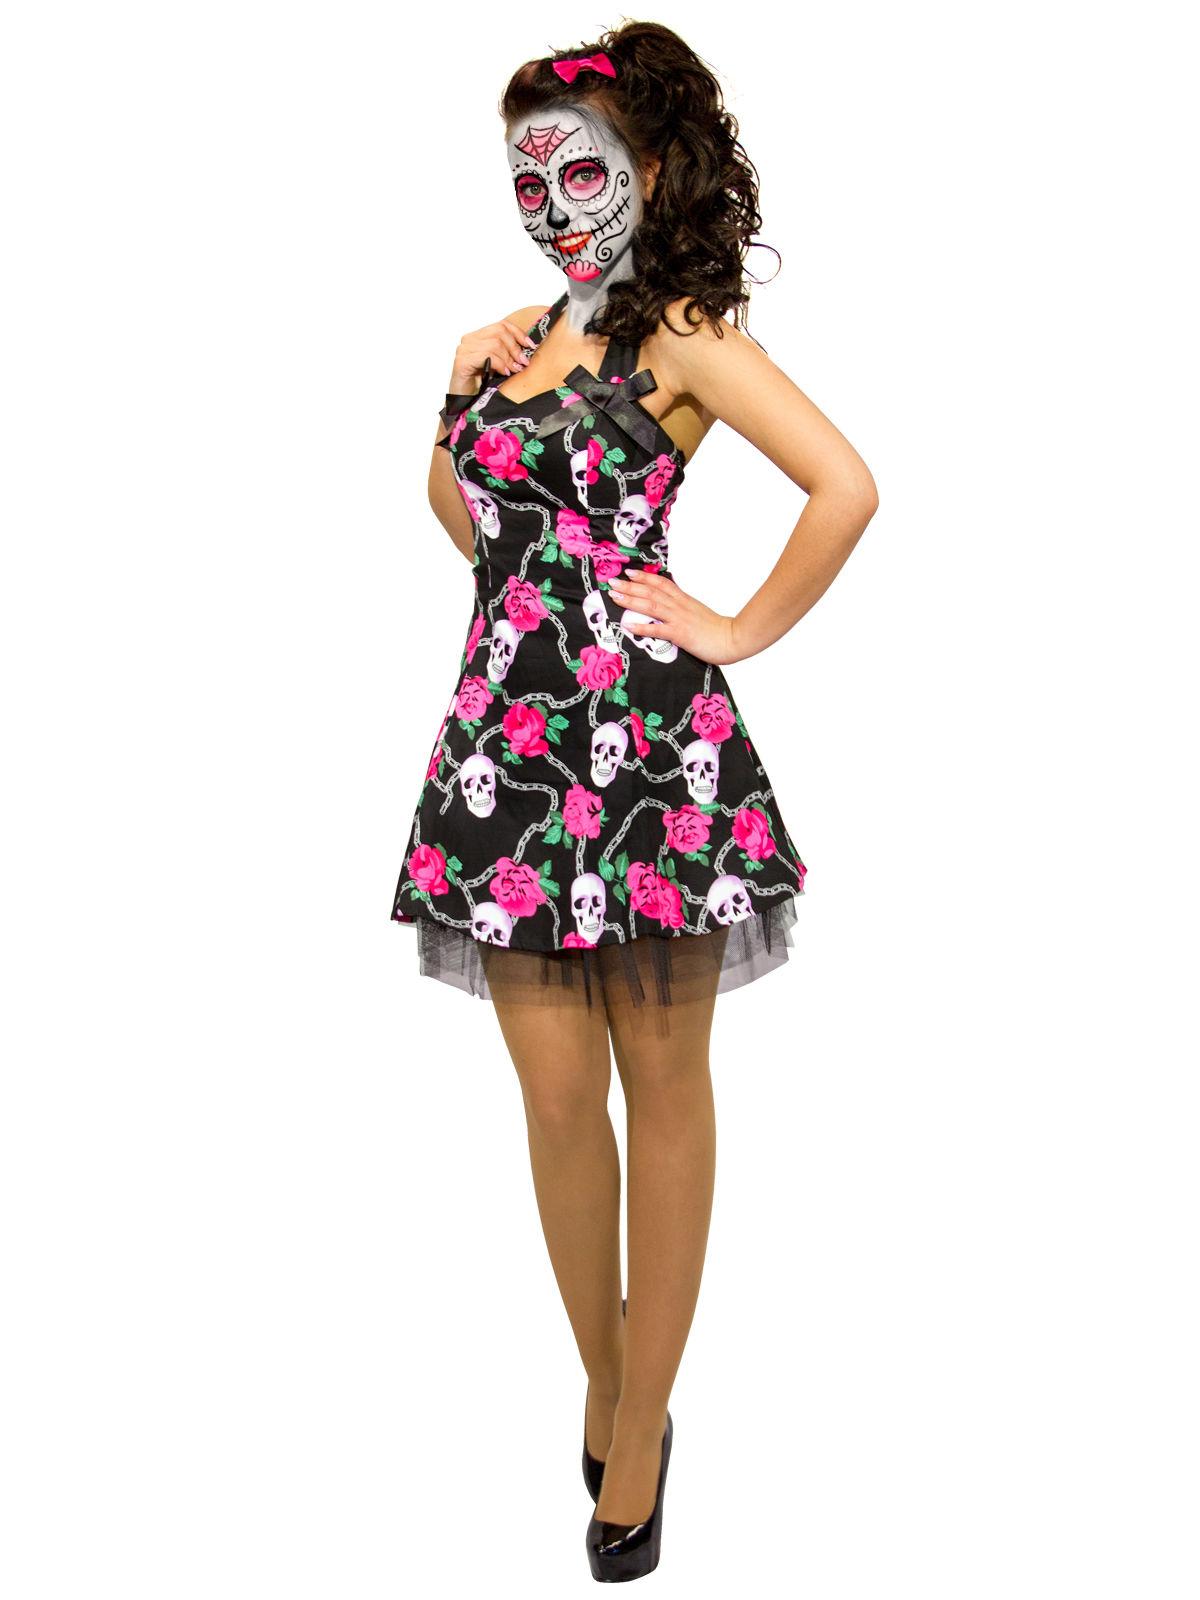 Deguisement Robe Tete De Mort Dia De Los Muertos Deguise Toi Achat De Deguisements Adultes